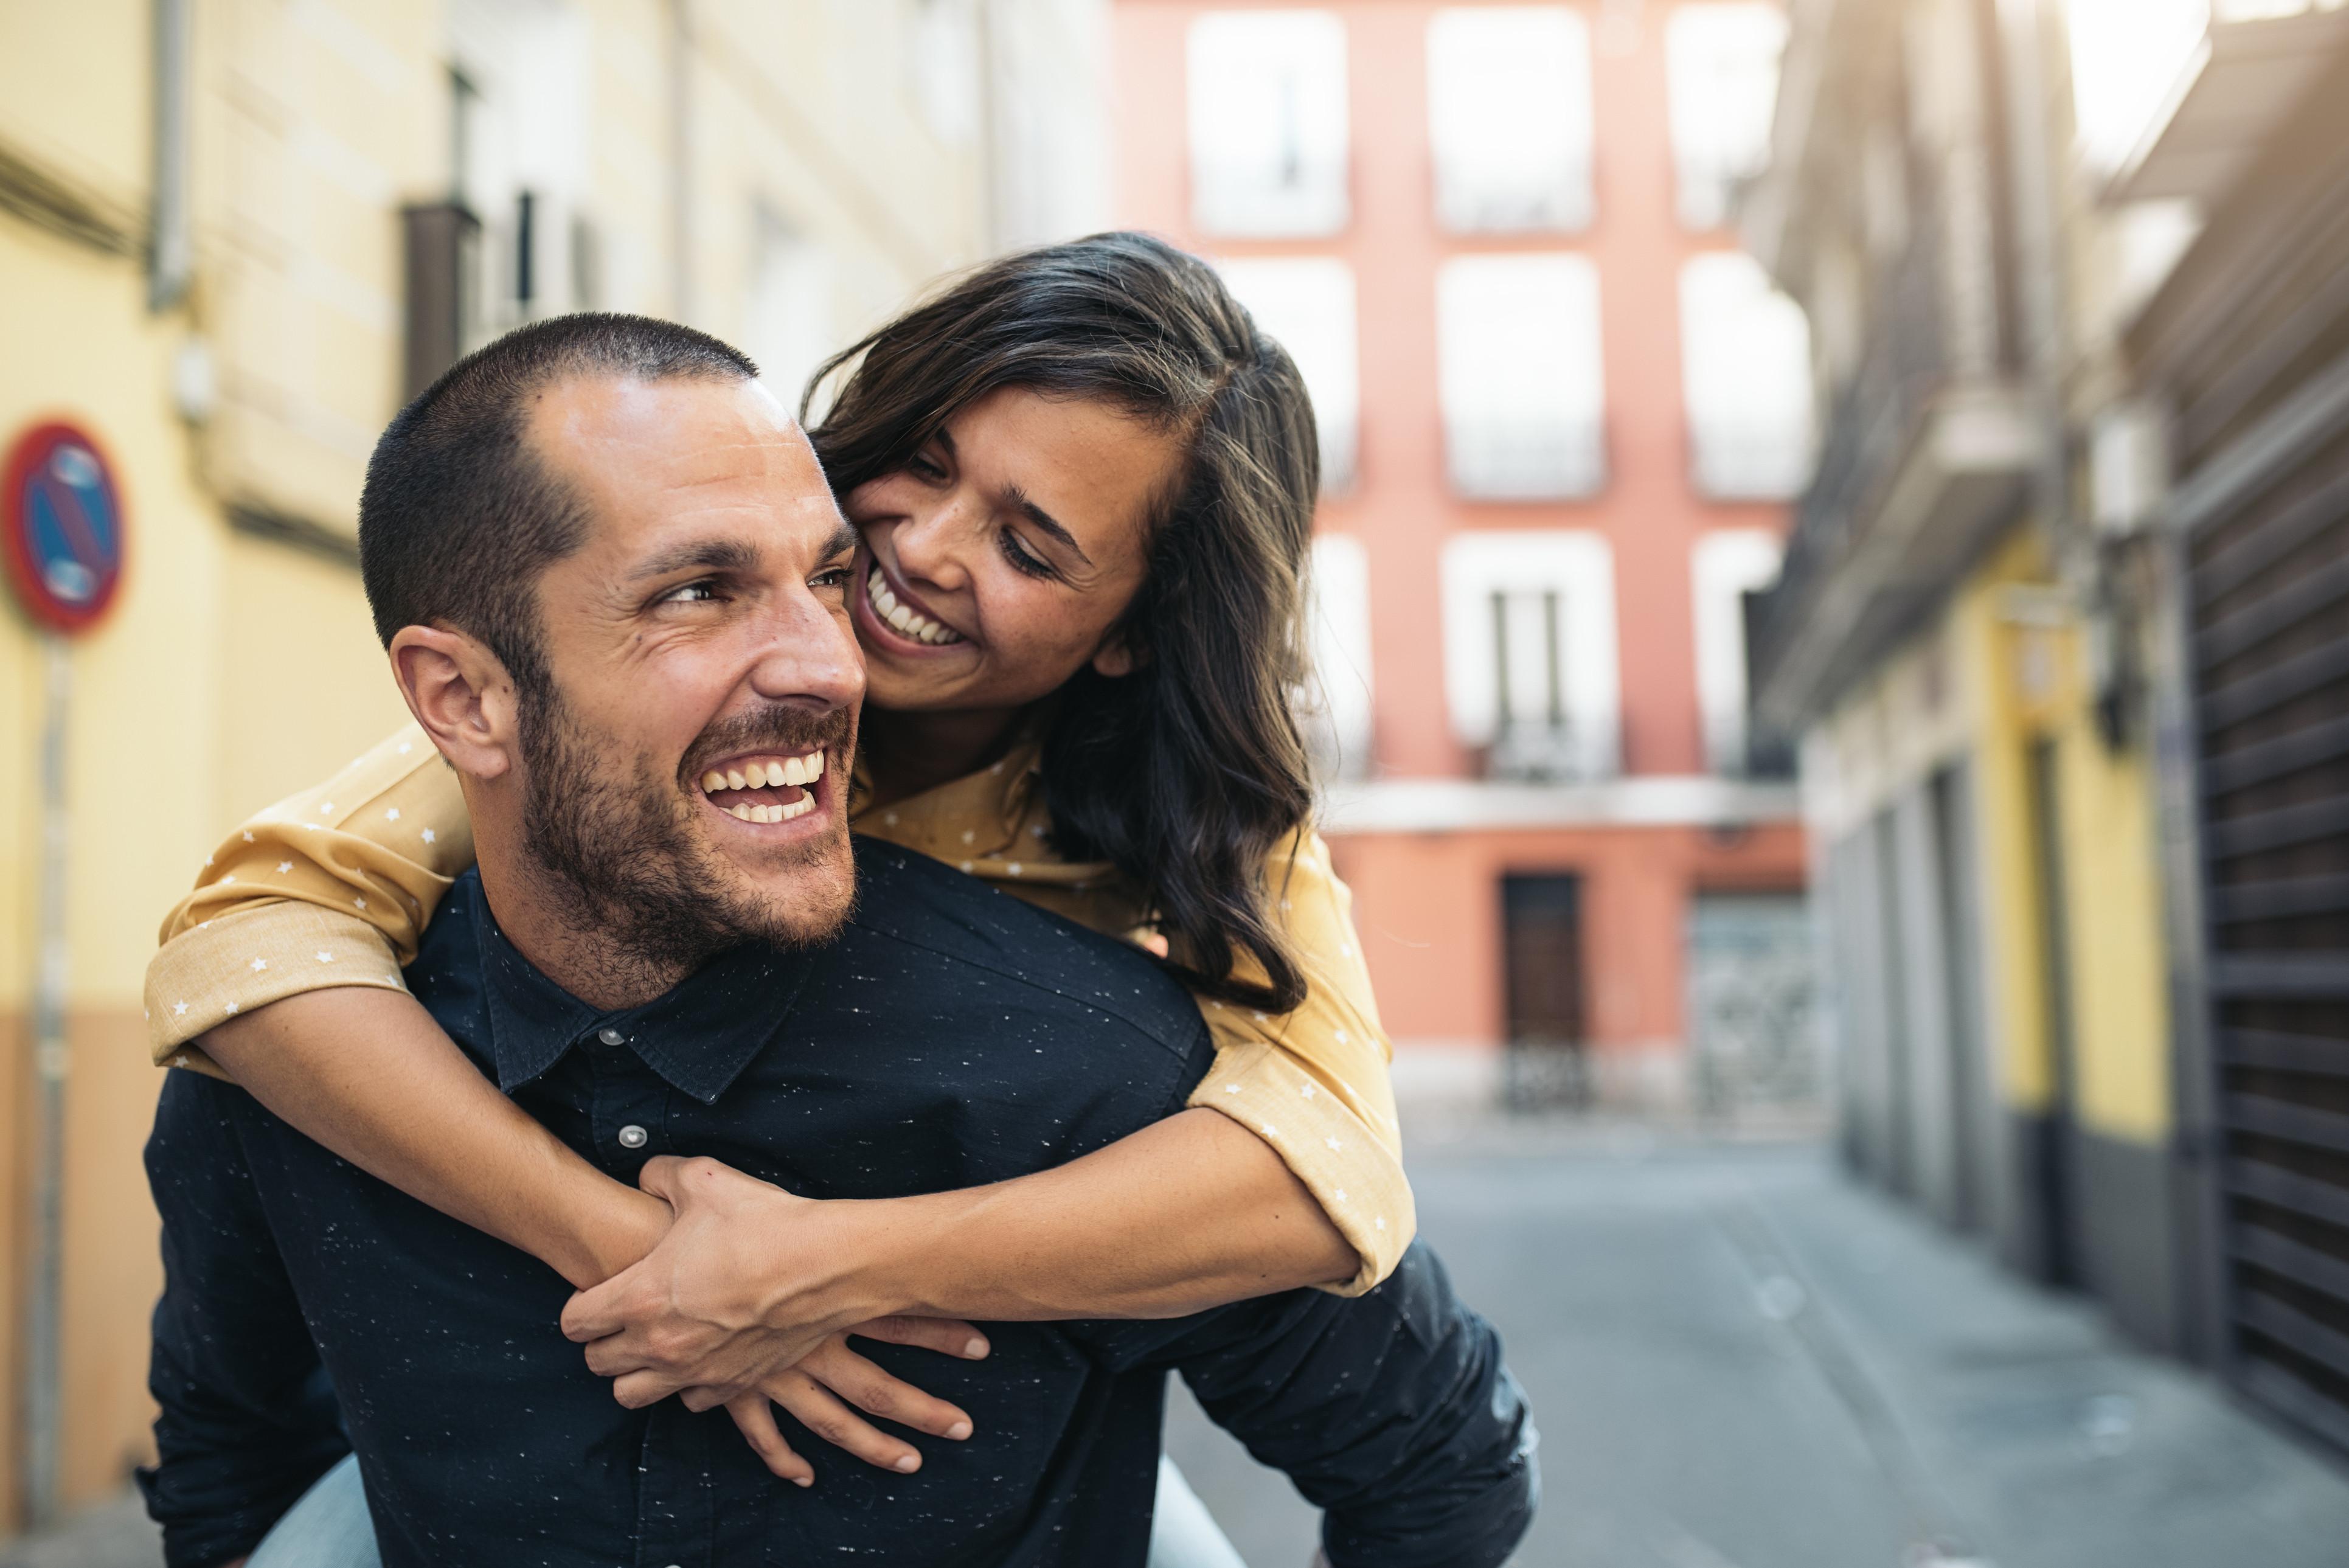 Esdla las dos torres version extendida online dating